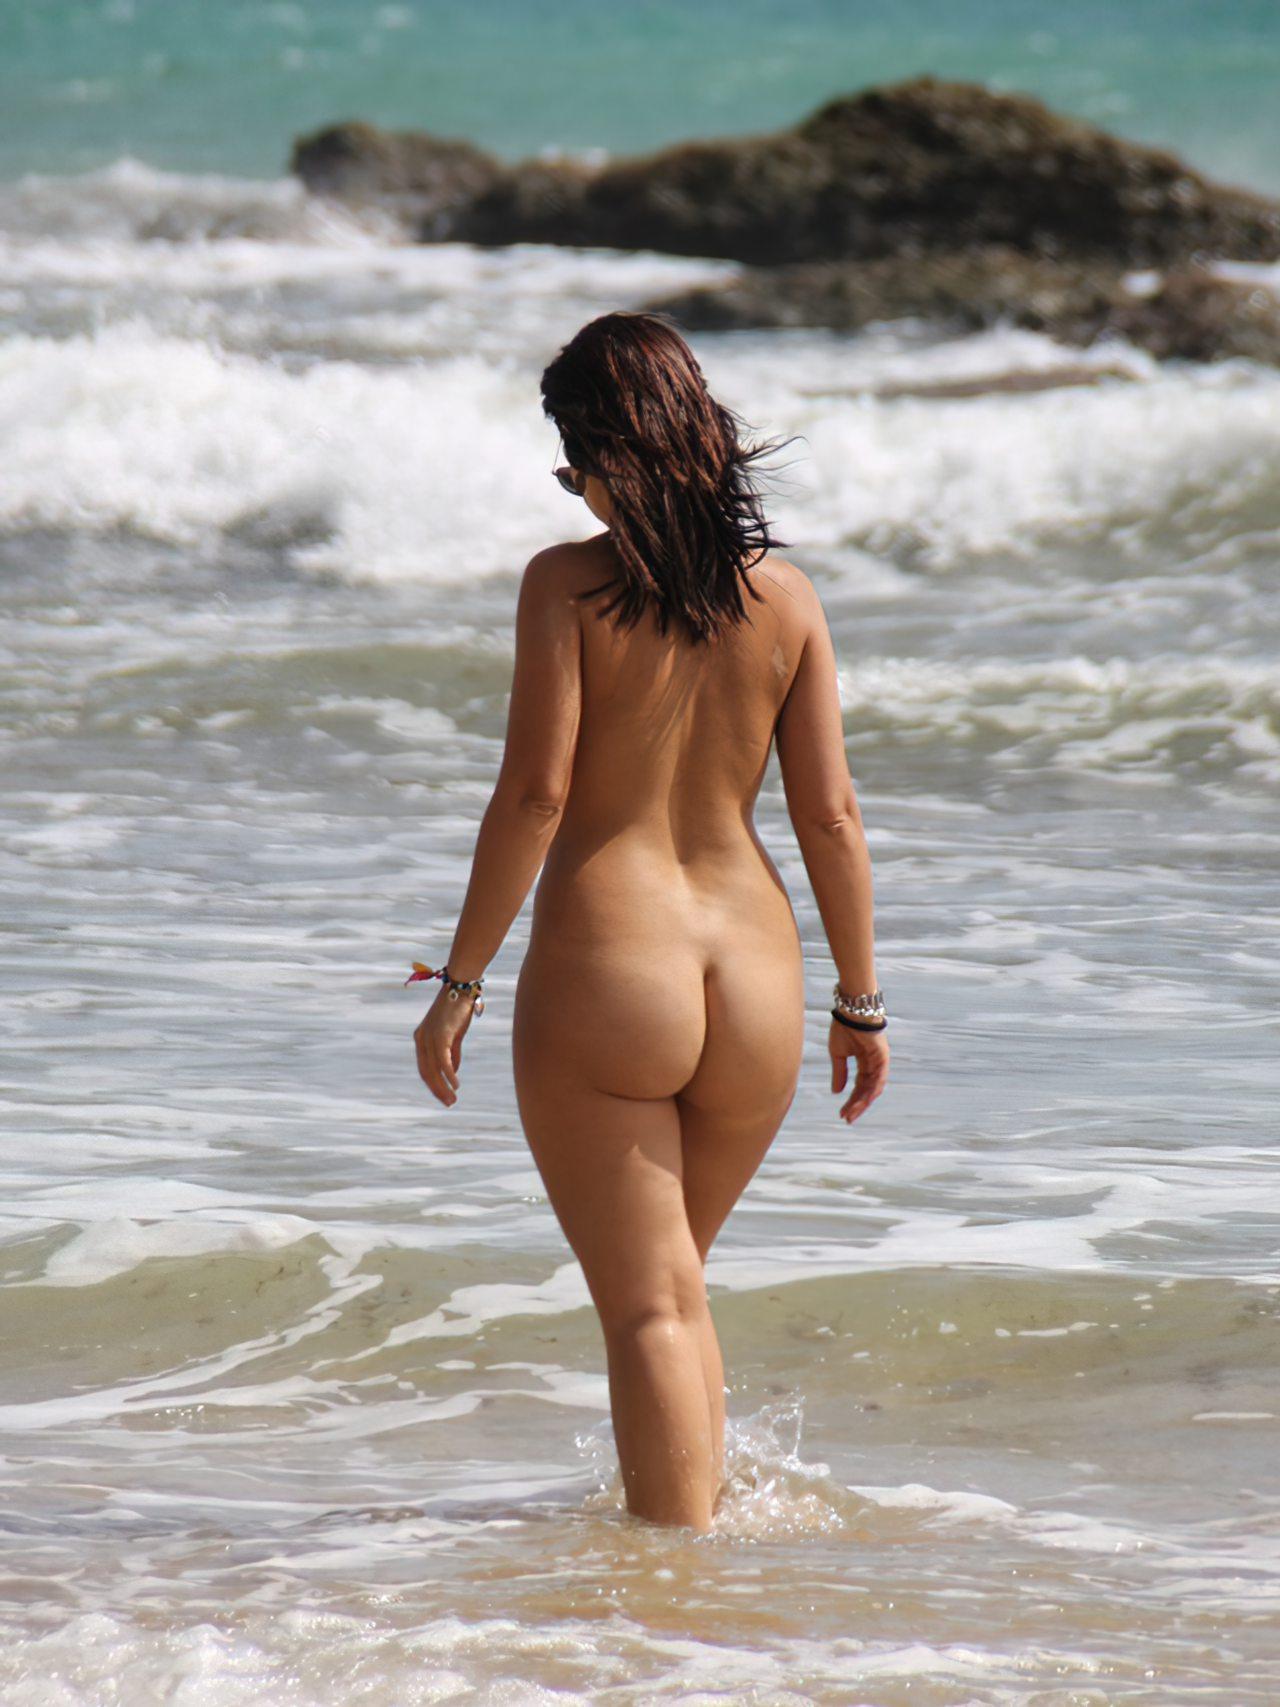 nude polanesian girls free pics